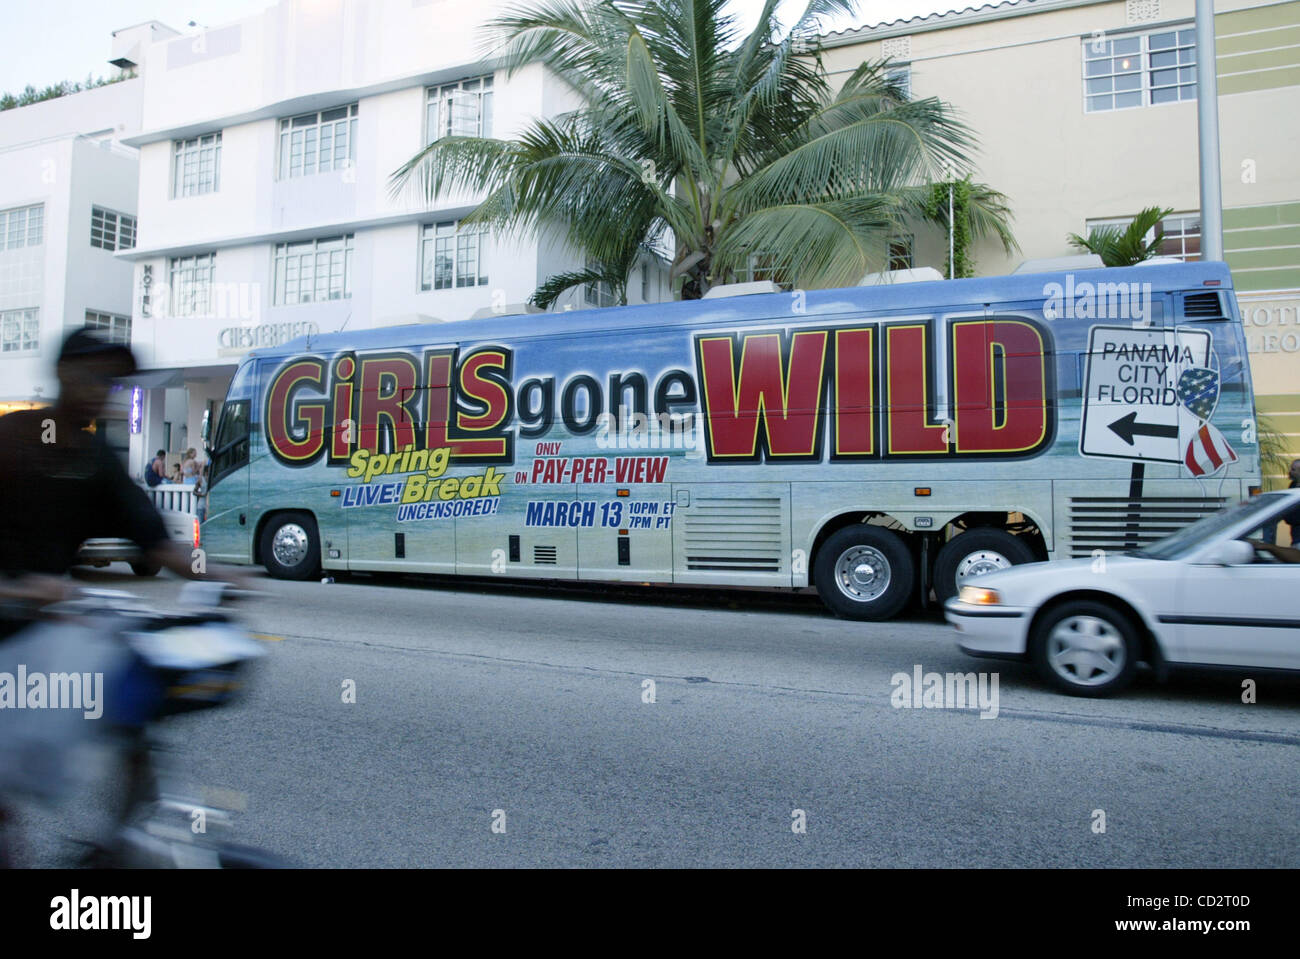 03122003 MIAMI Girls Gone Wild bus south beach RICHARD GRAULICH. - Stock  Image